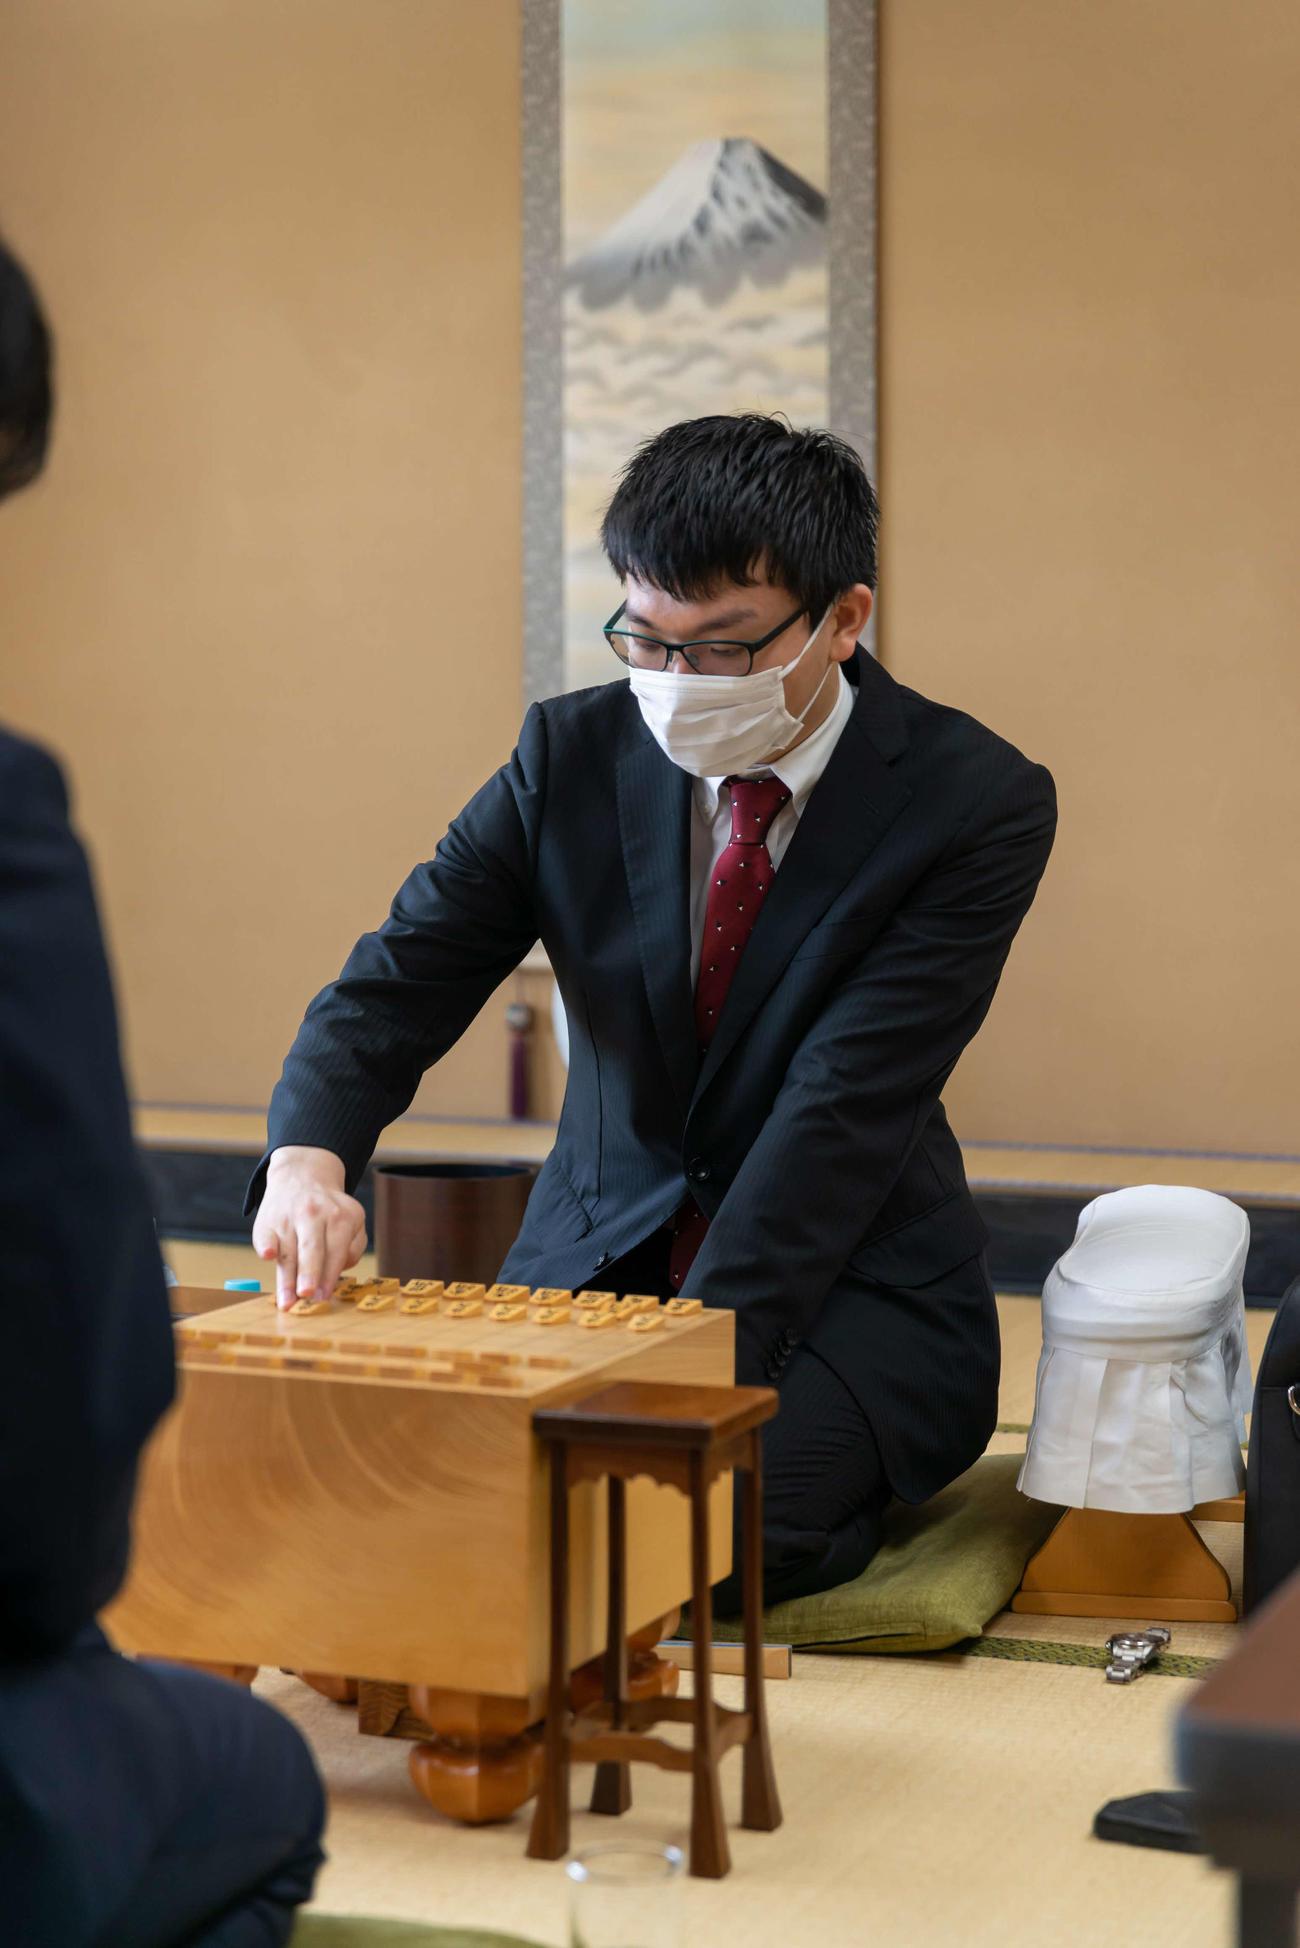 第91期棋聖戦挑戦者決定戦で対局する永瀬拓矢2冠(日本将棋連盟提供)